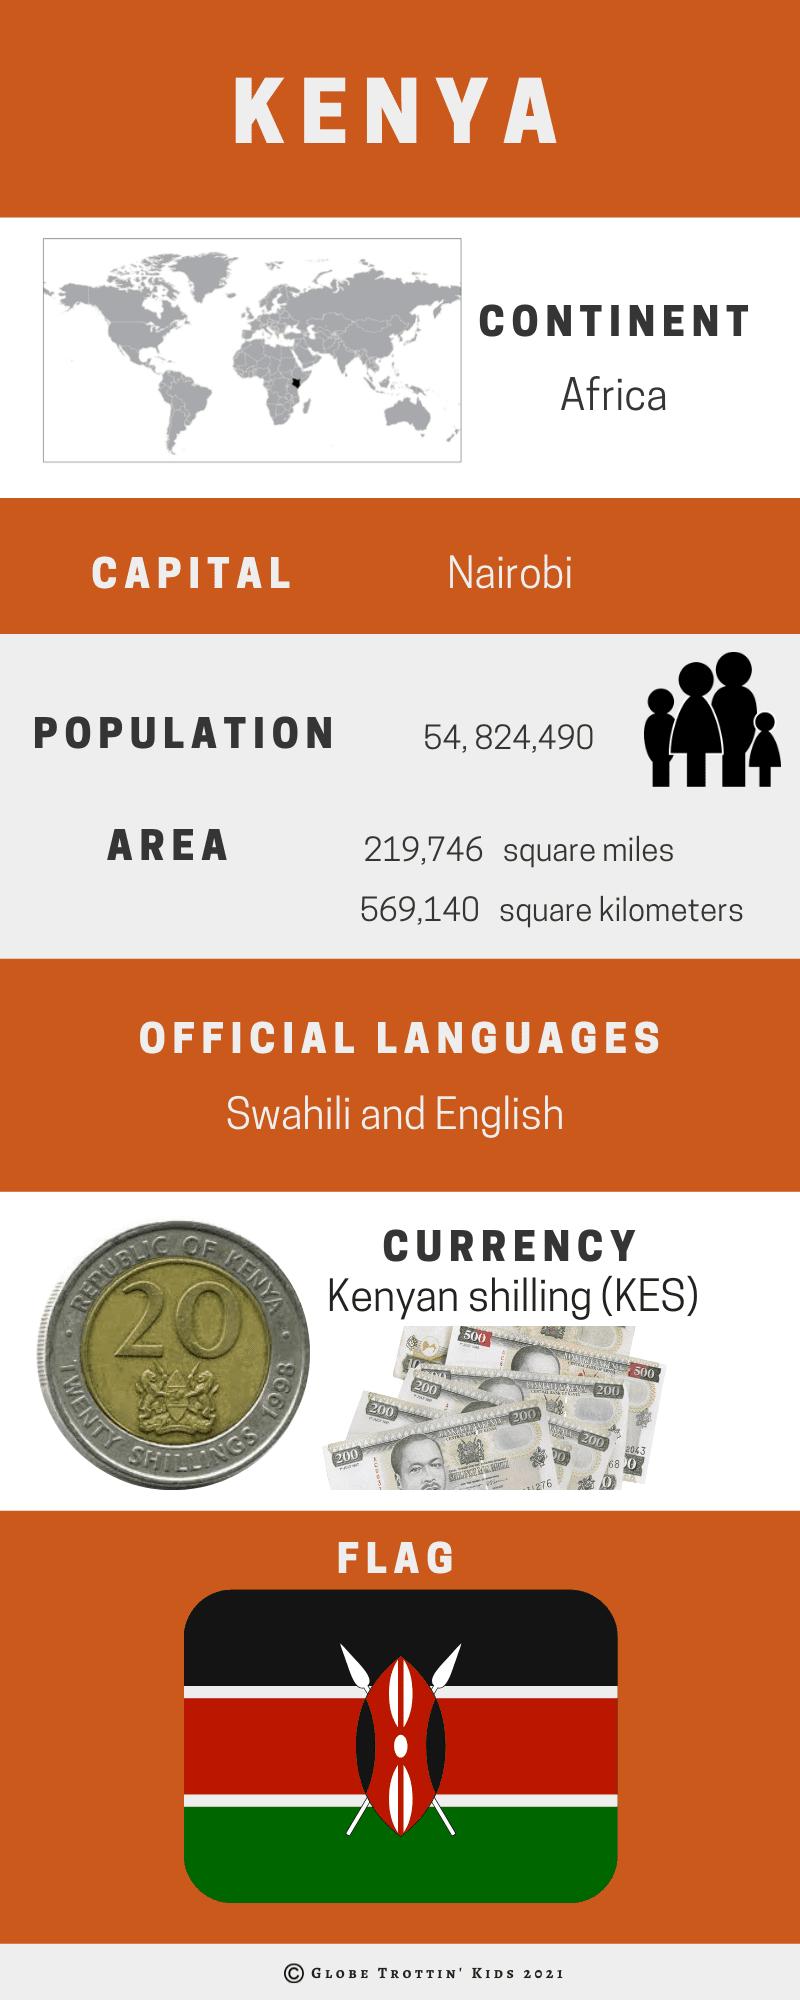 kenya-infographic